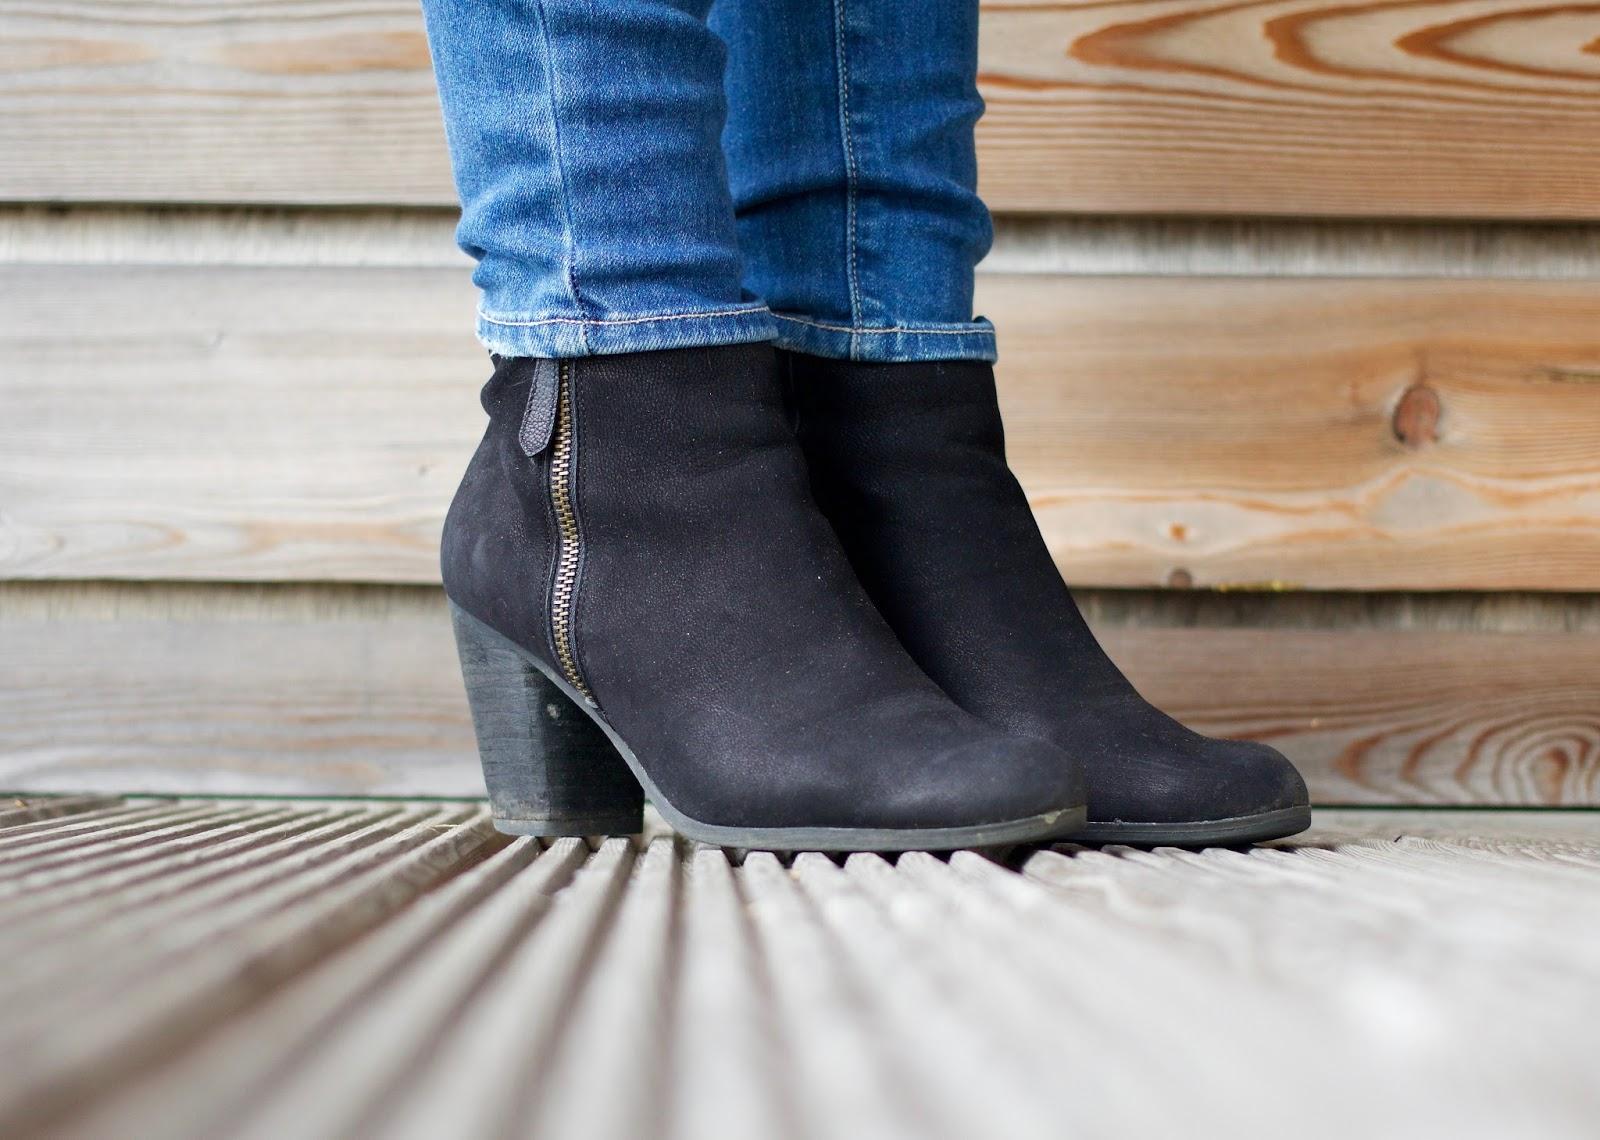 Autumnal wardrobe-BP black nubuck side zip heeled ankle boots